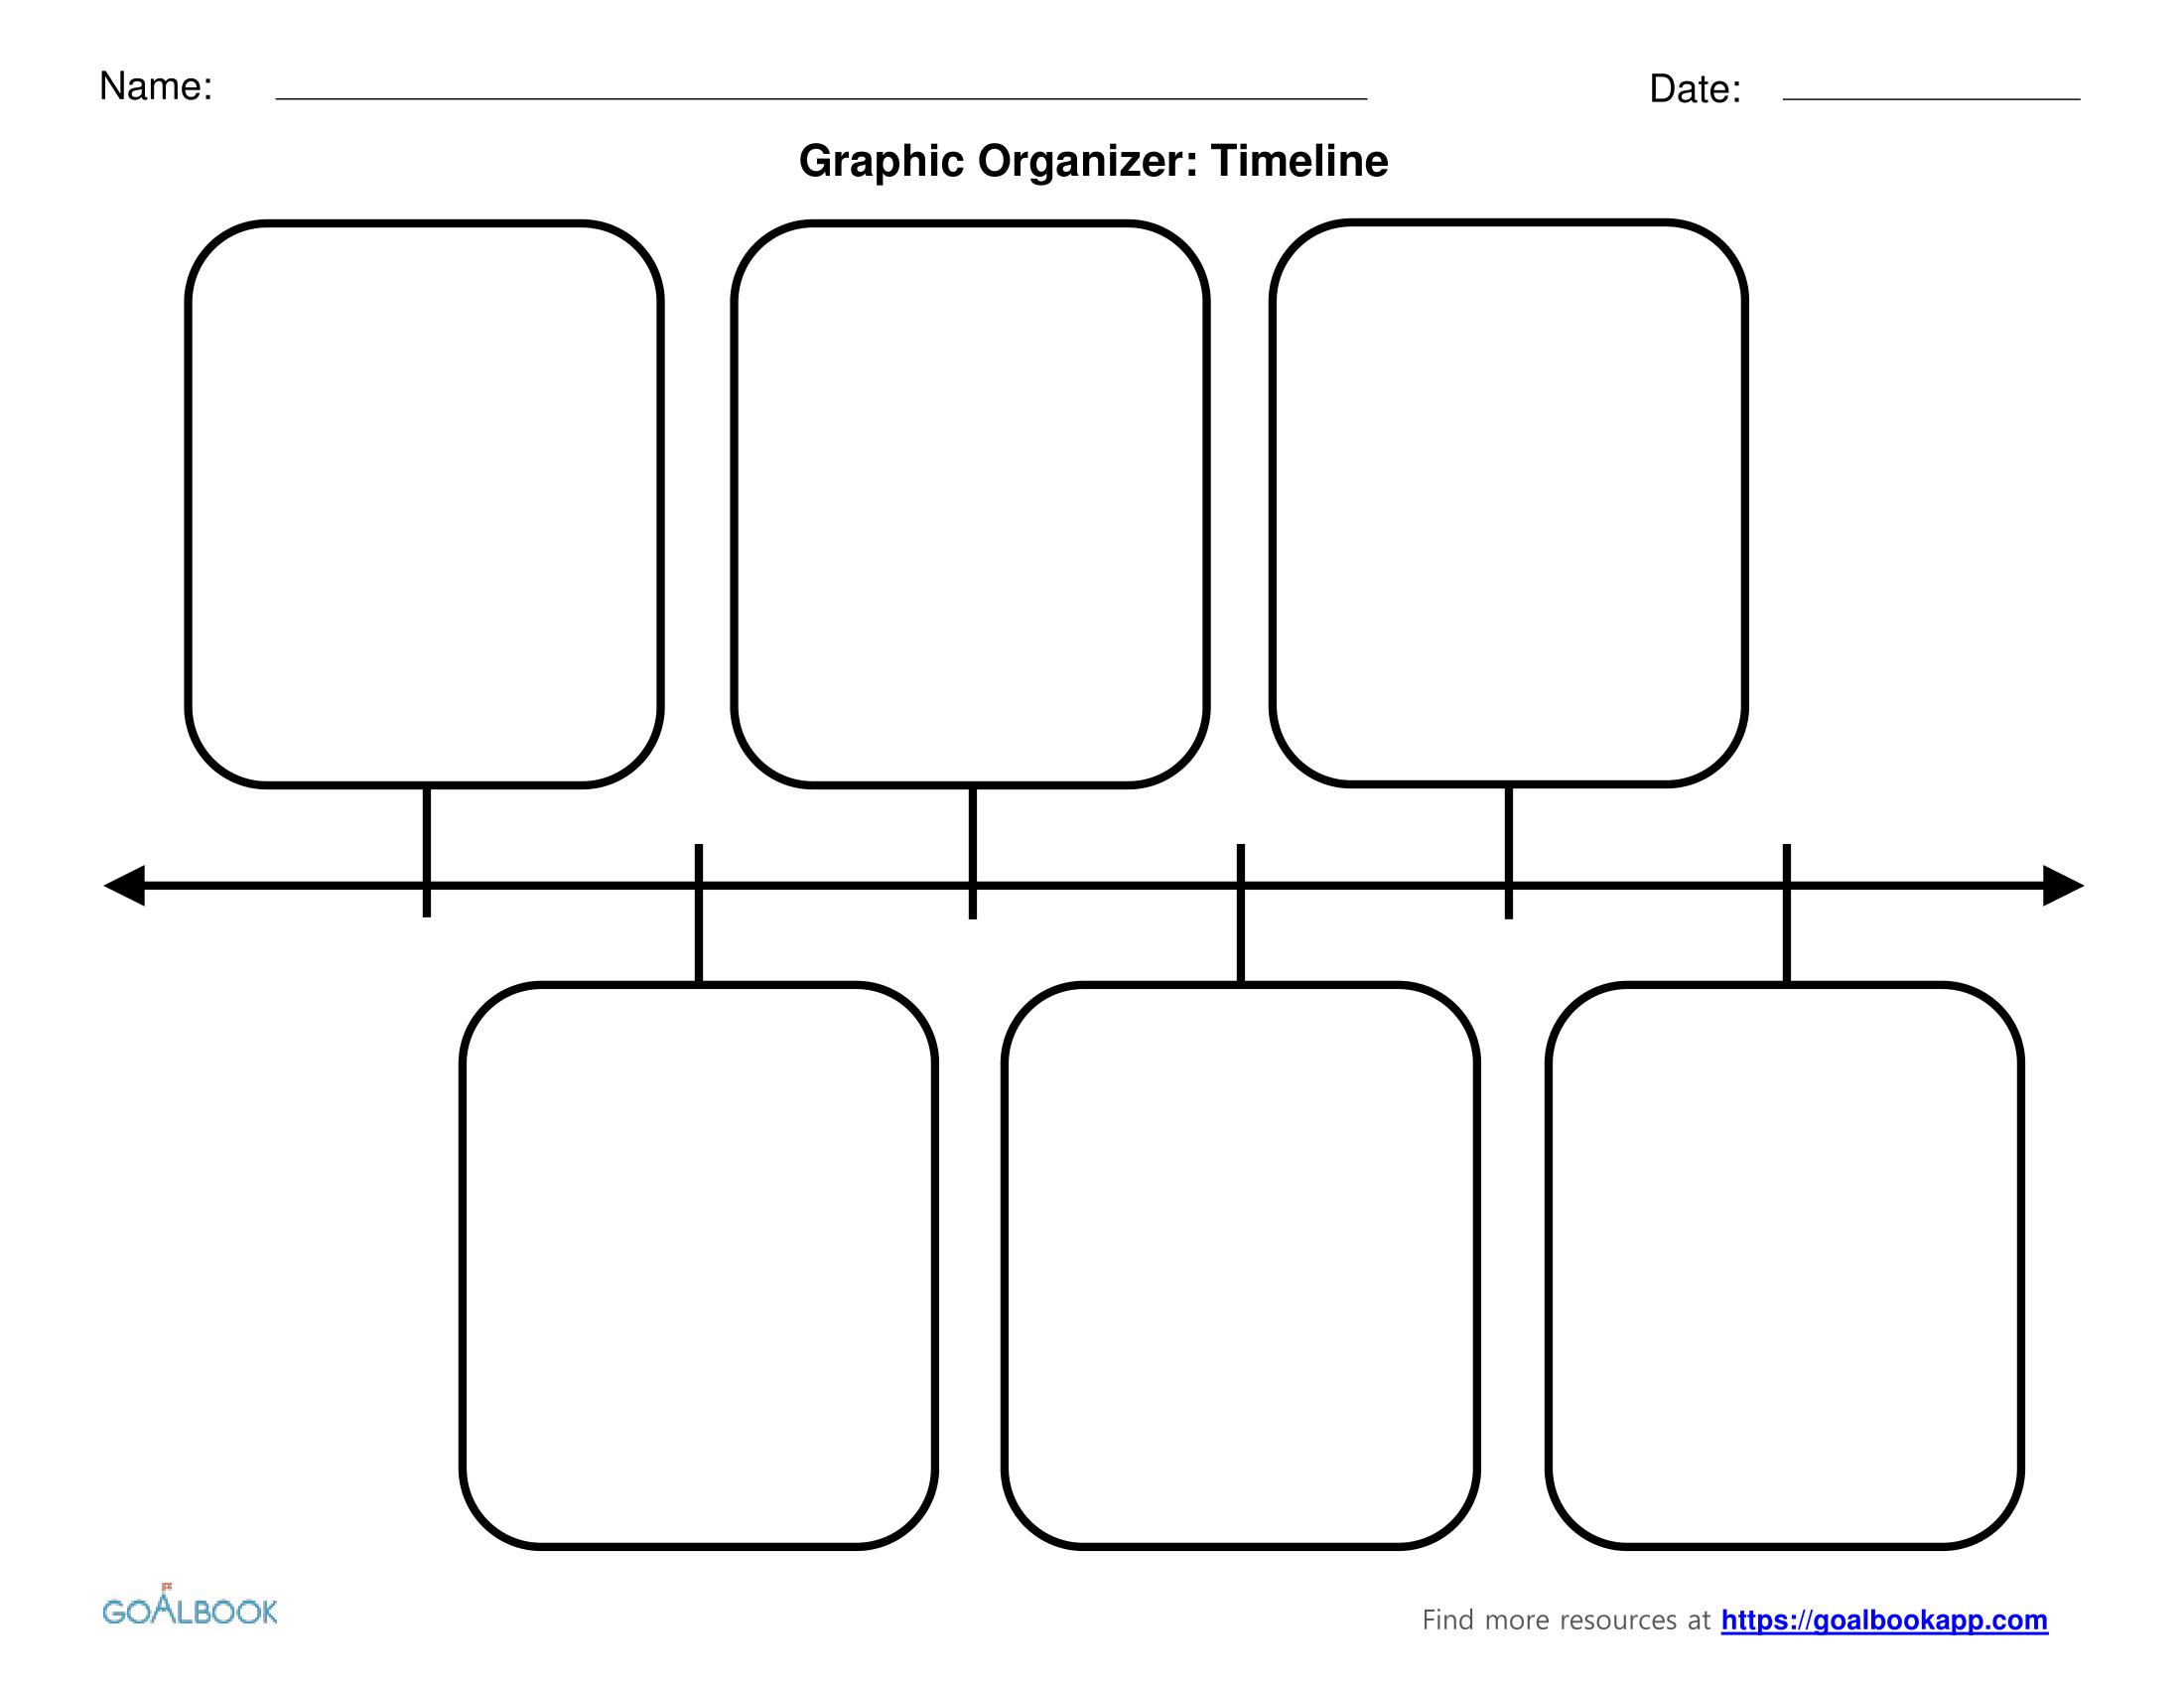 018 03 Timeline Blank Essay Example Five Paragraph Graphic Wonderful Organizer High School Definition 5 Pdf Full